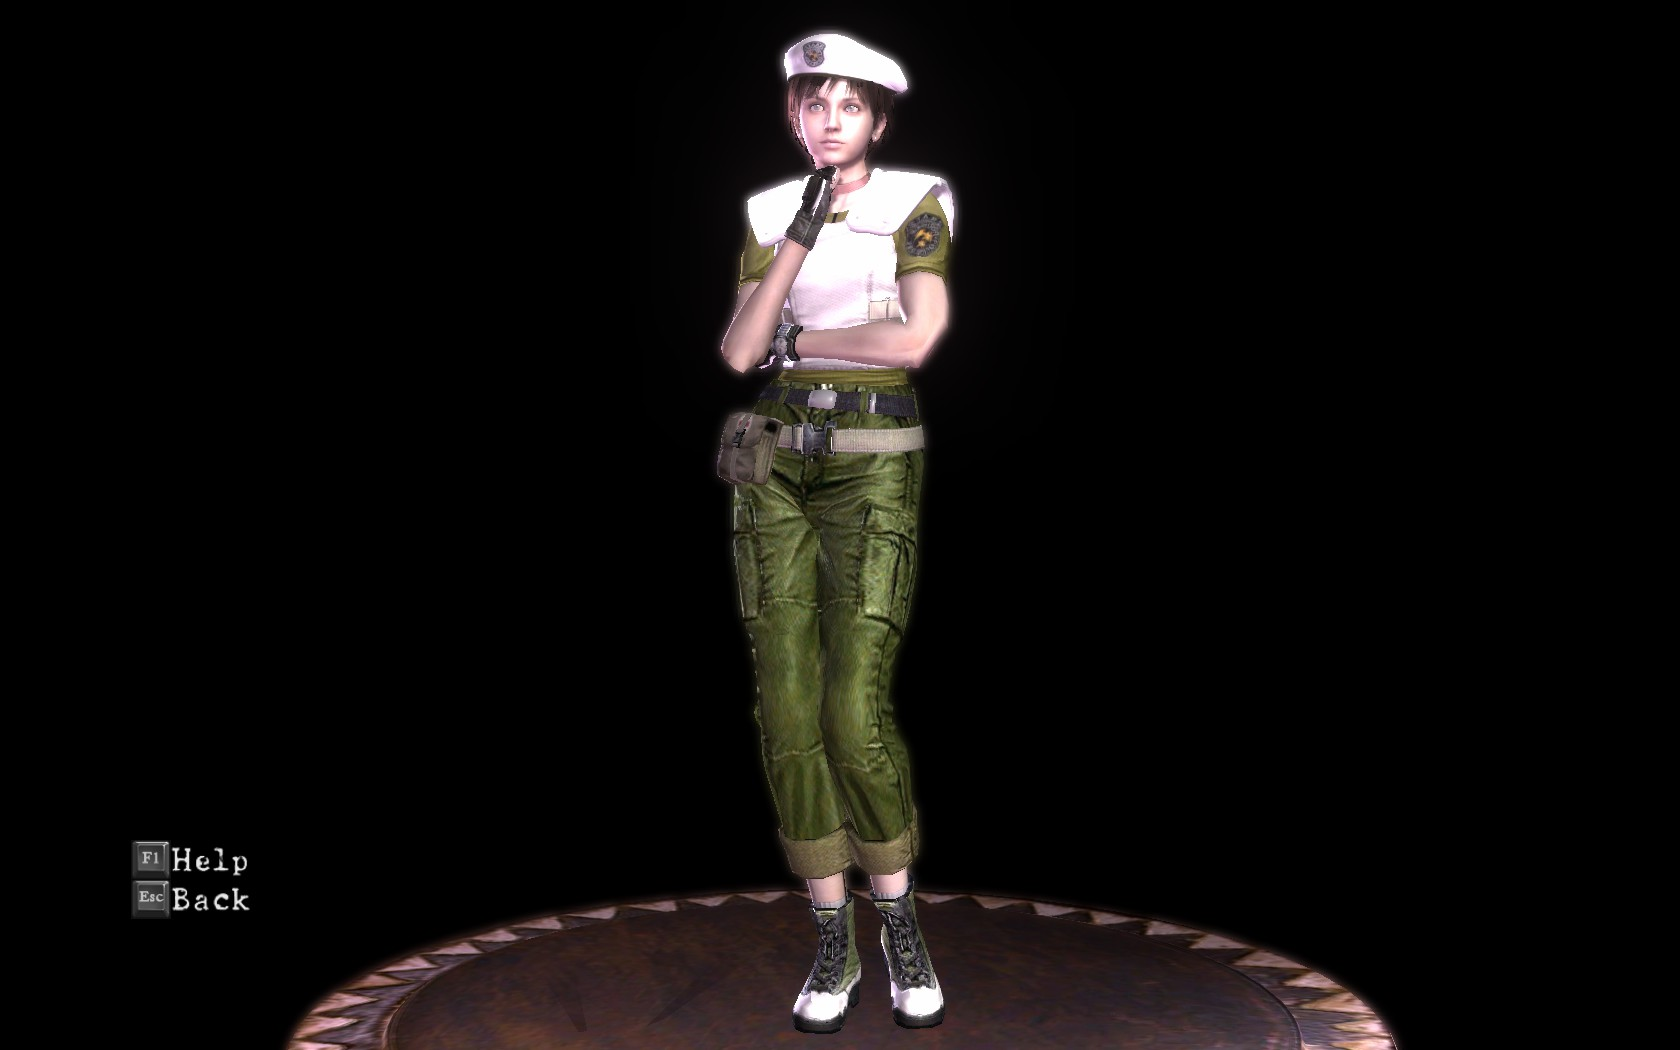 Rebecca alpha version Resident Evil 0 0_116371_79b912b0_orig